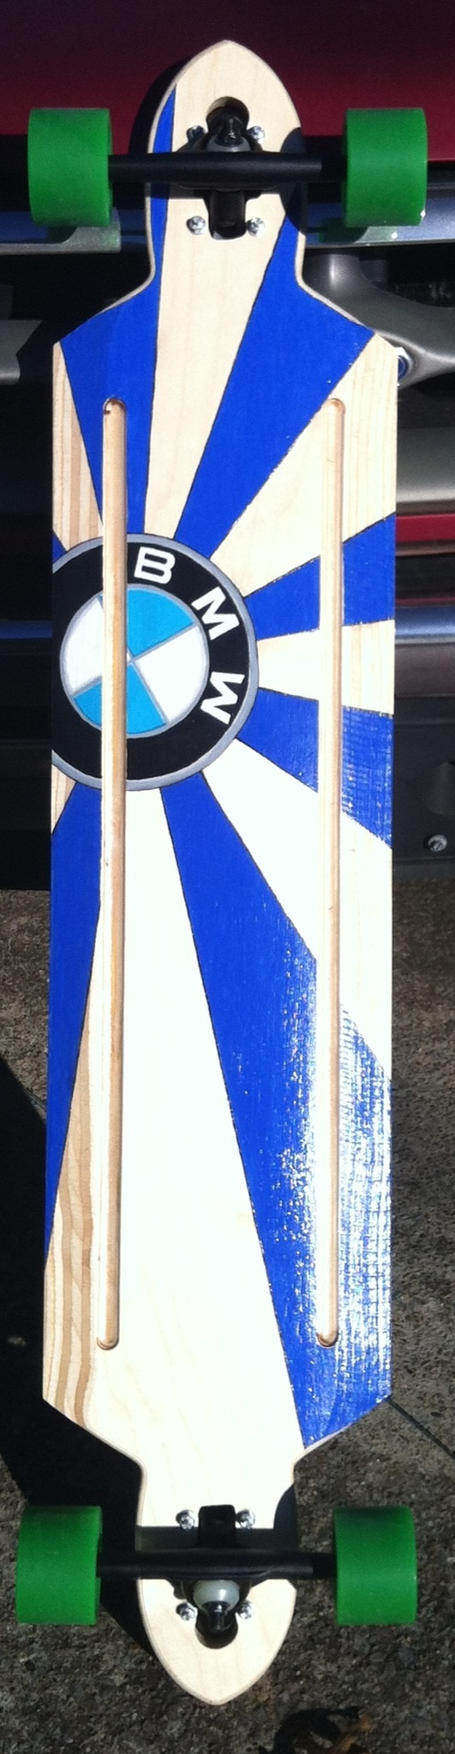 BMW longboard by whereisthefall